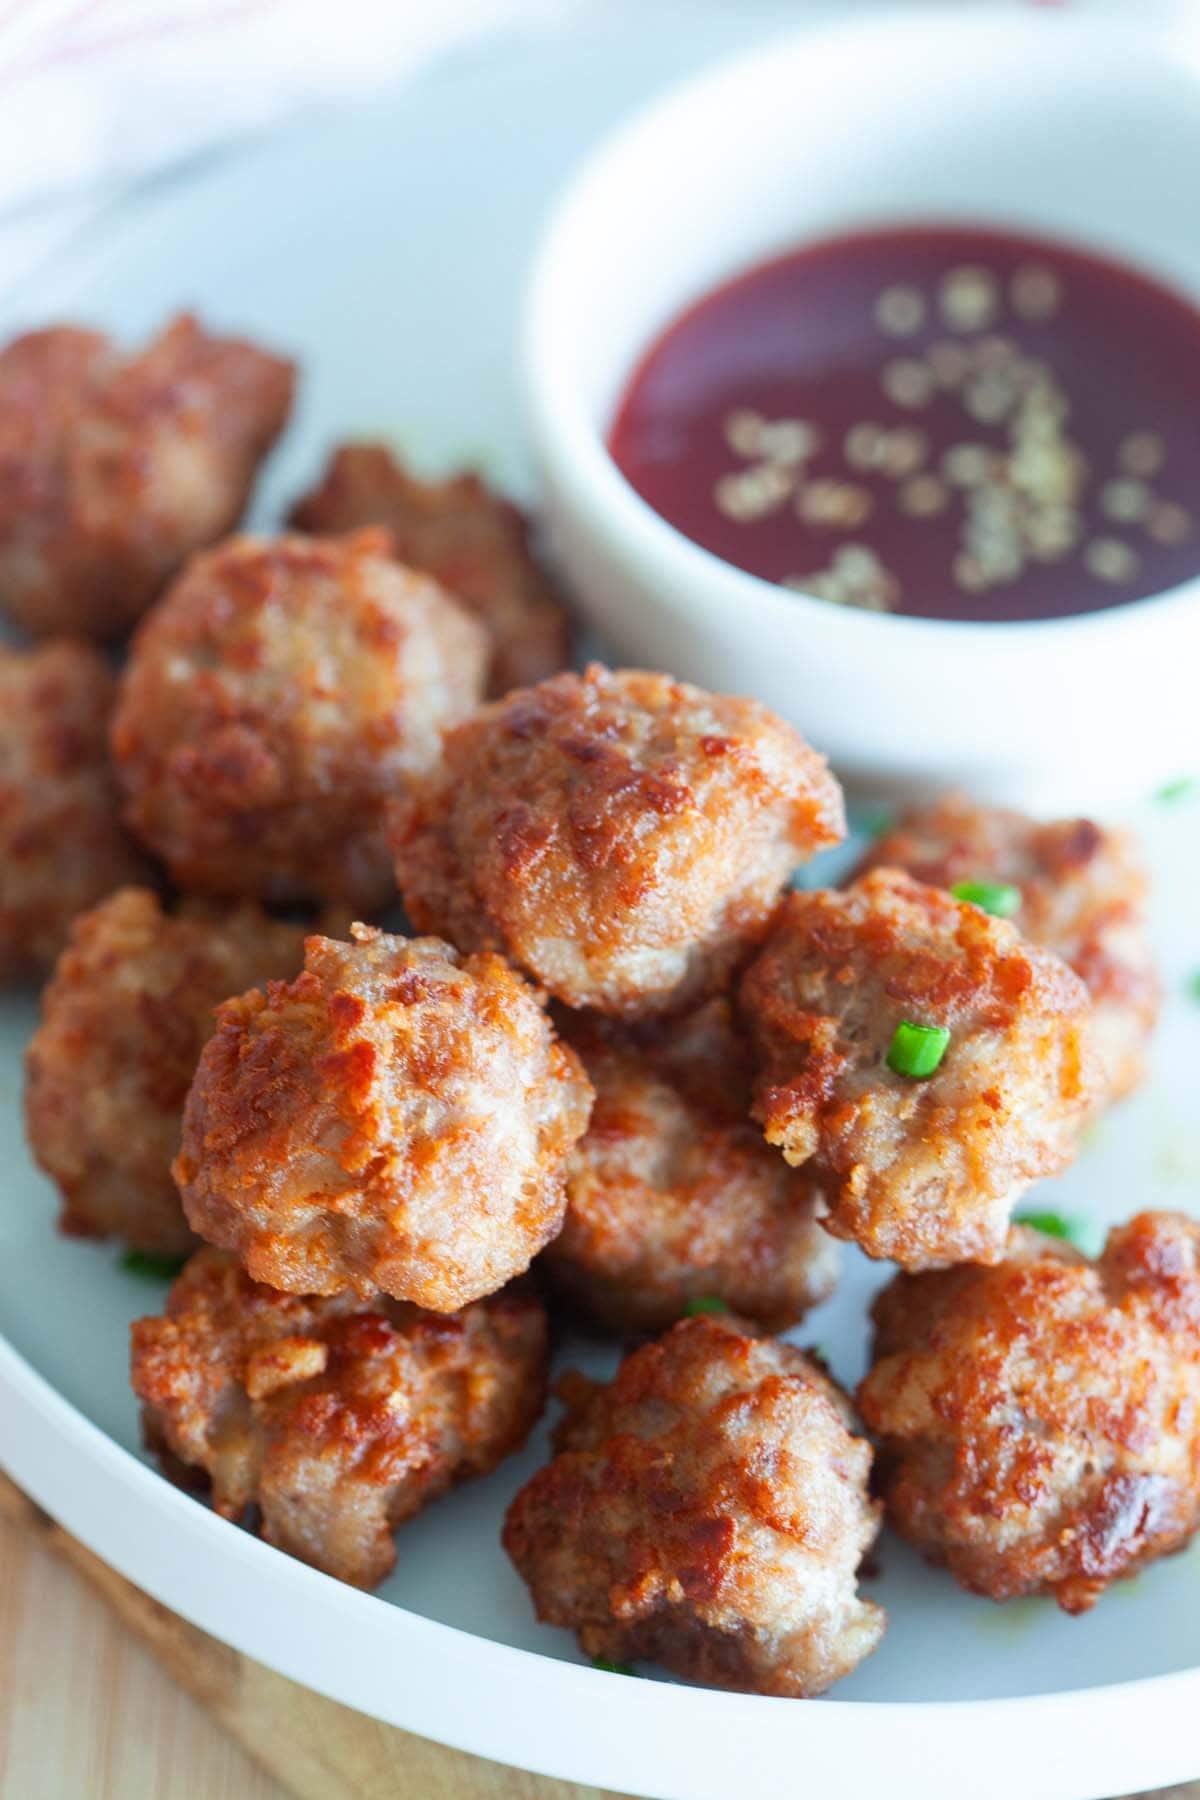 Easy recipe for fried meatballs.